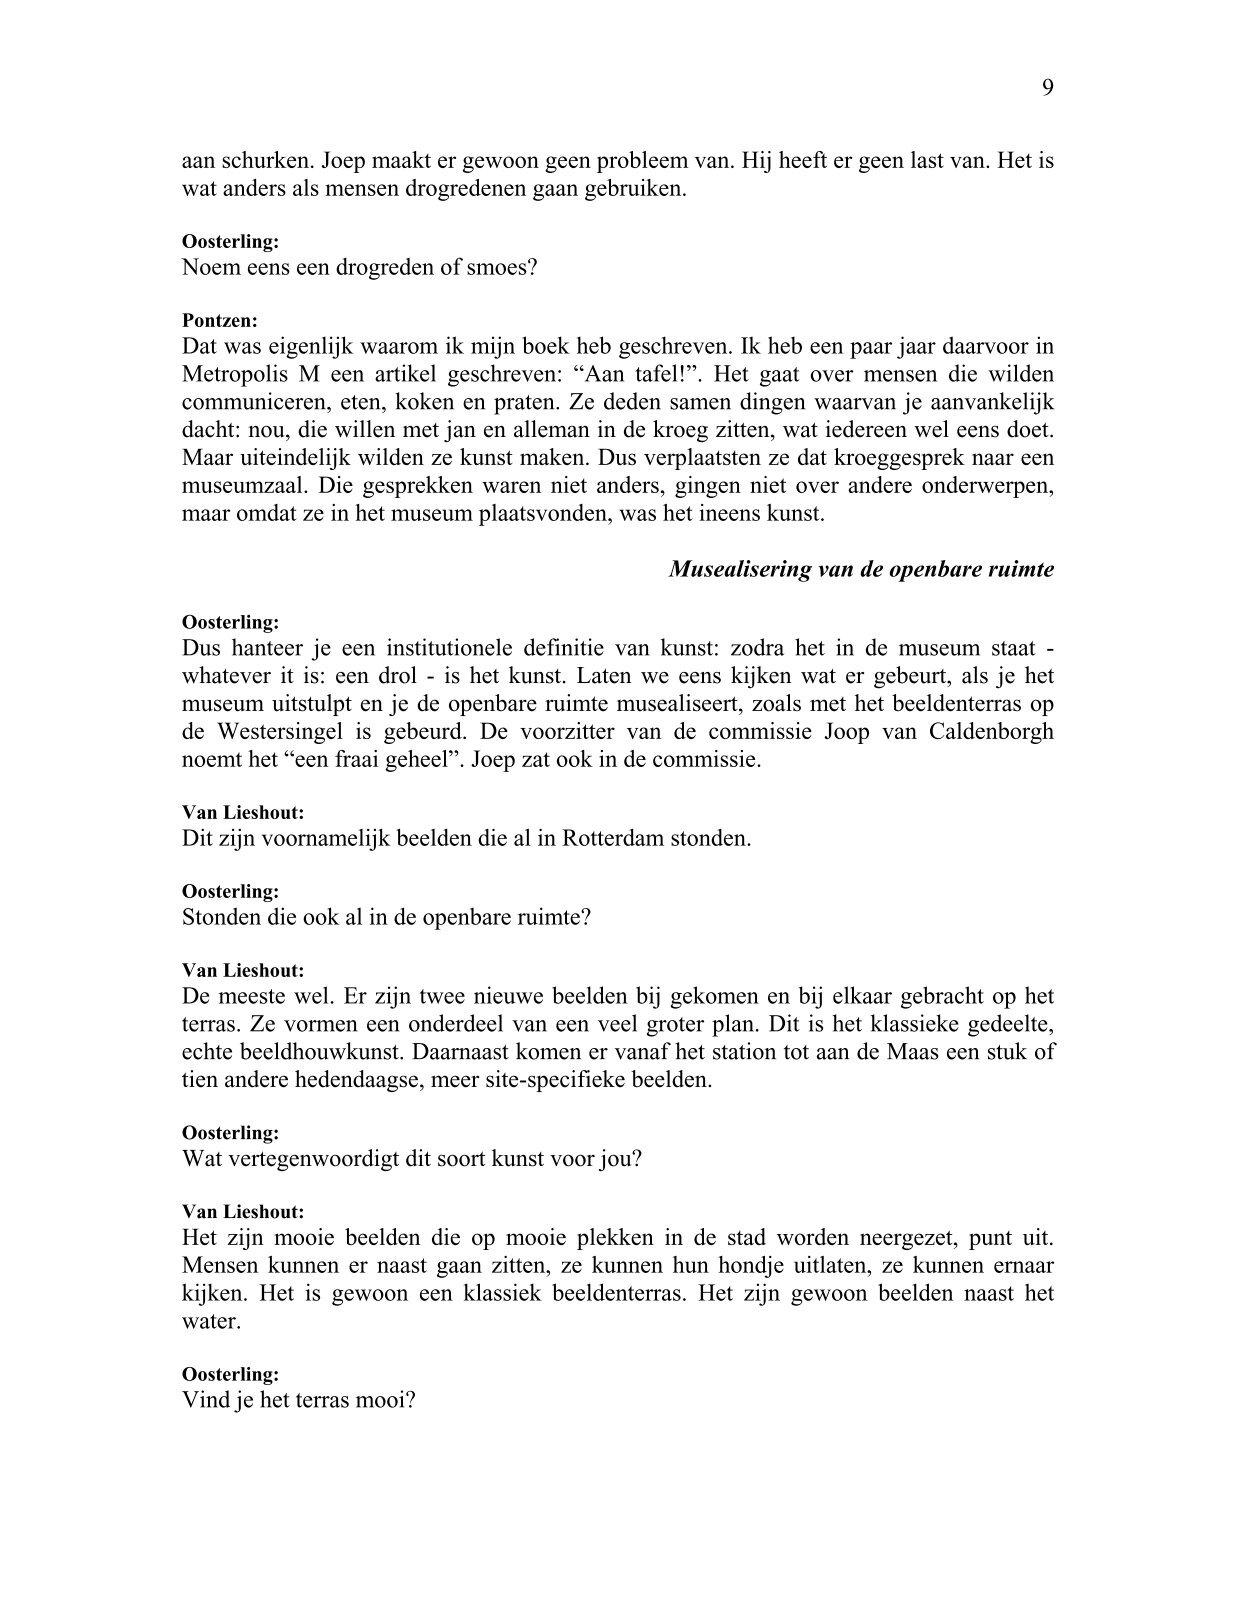 Https Yumpucom En Document View 43740372 Spalding Mooi Printing Premium Sweater Top Kunst In De Openbare Ruimte